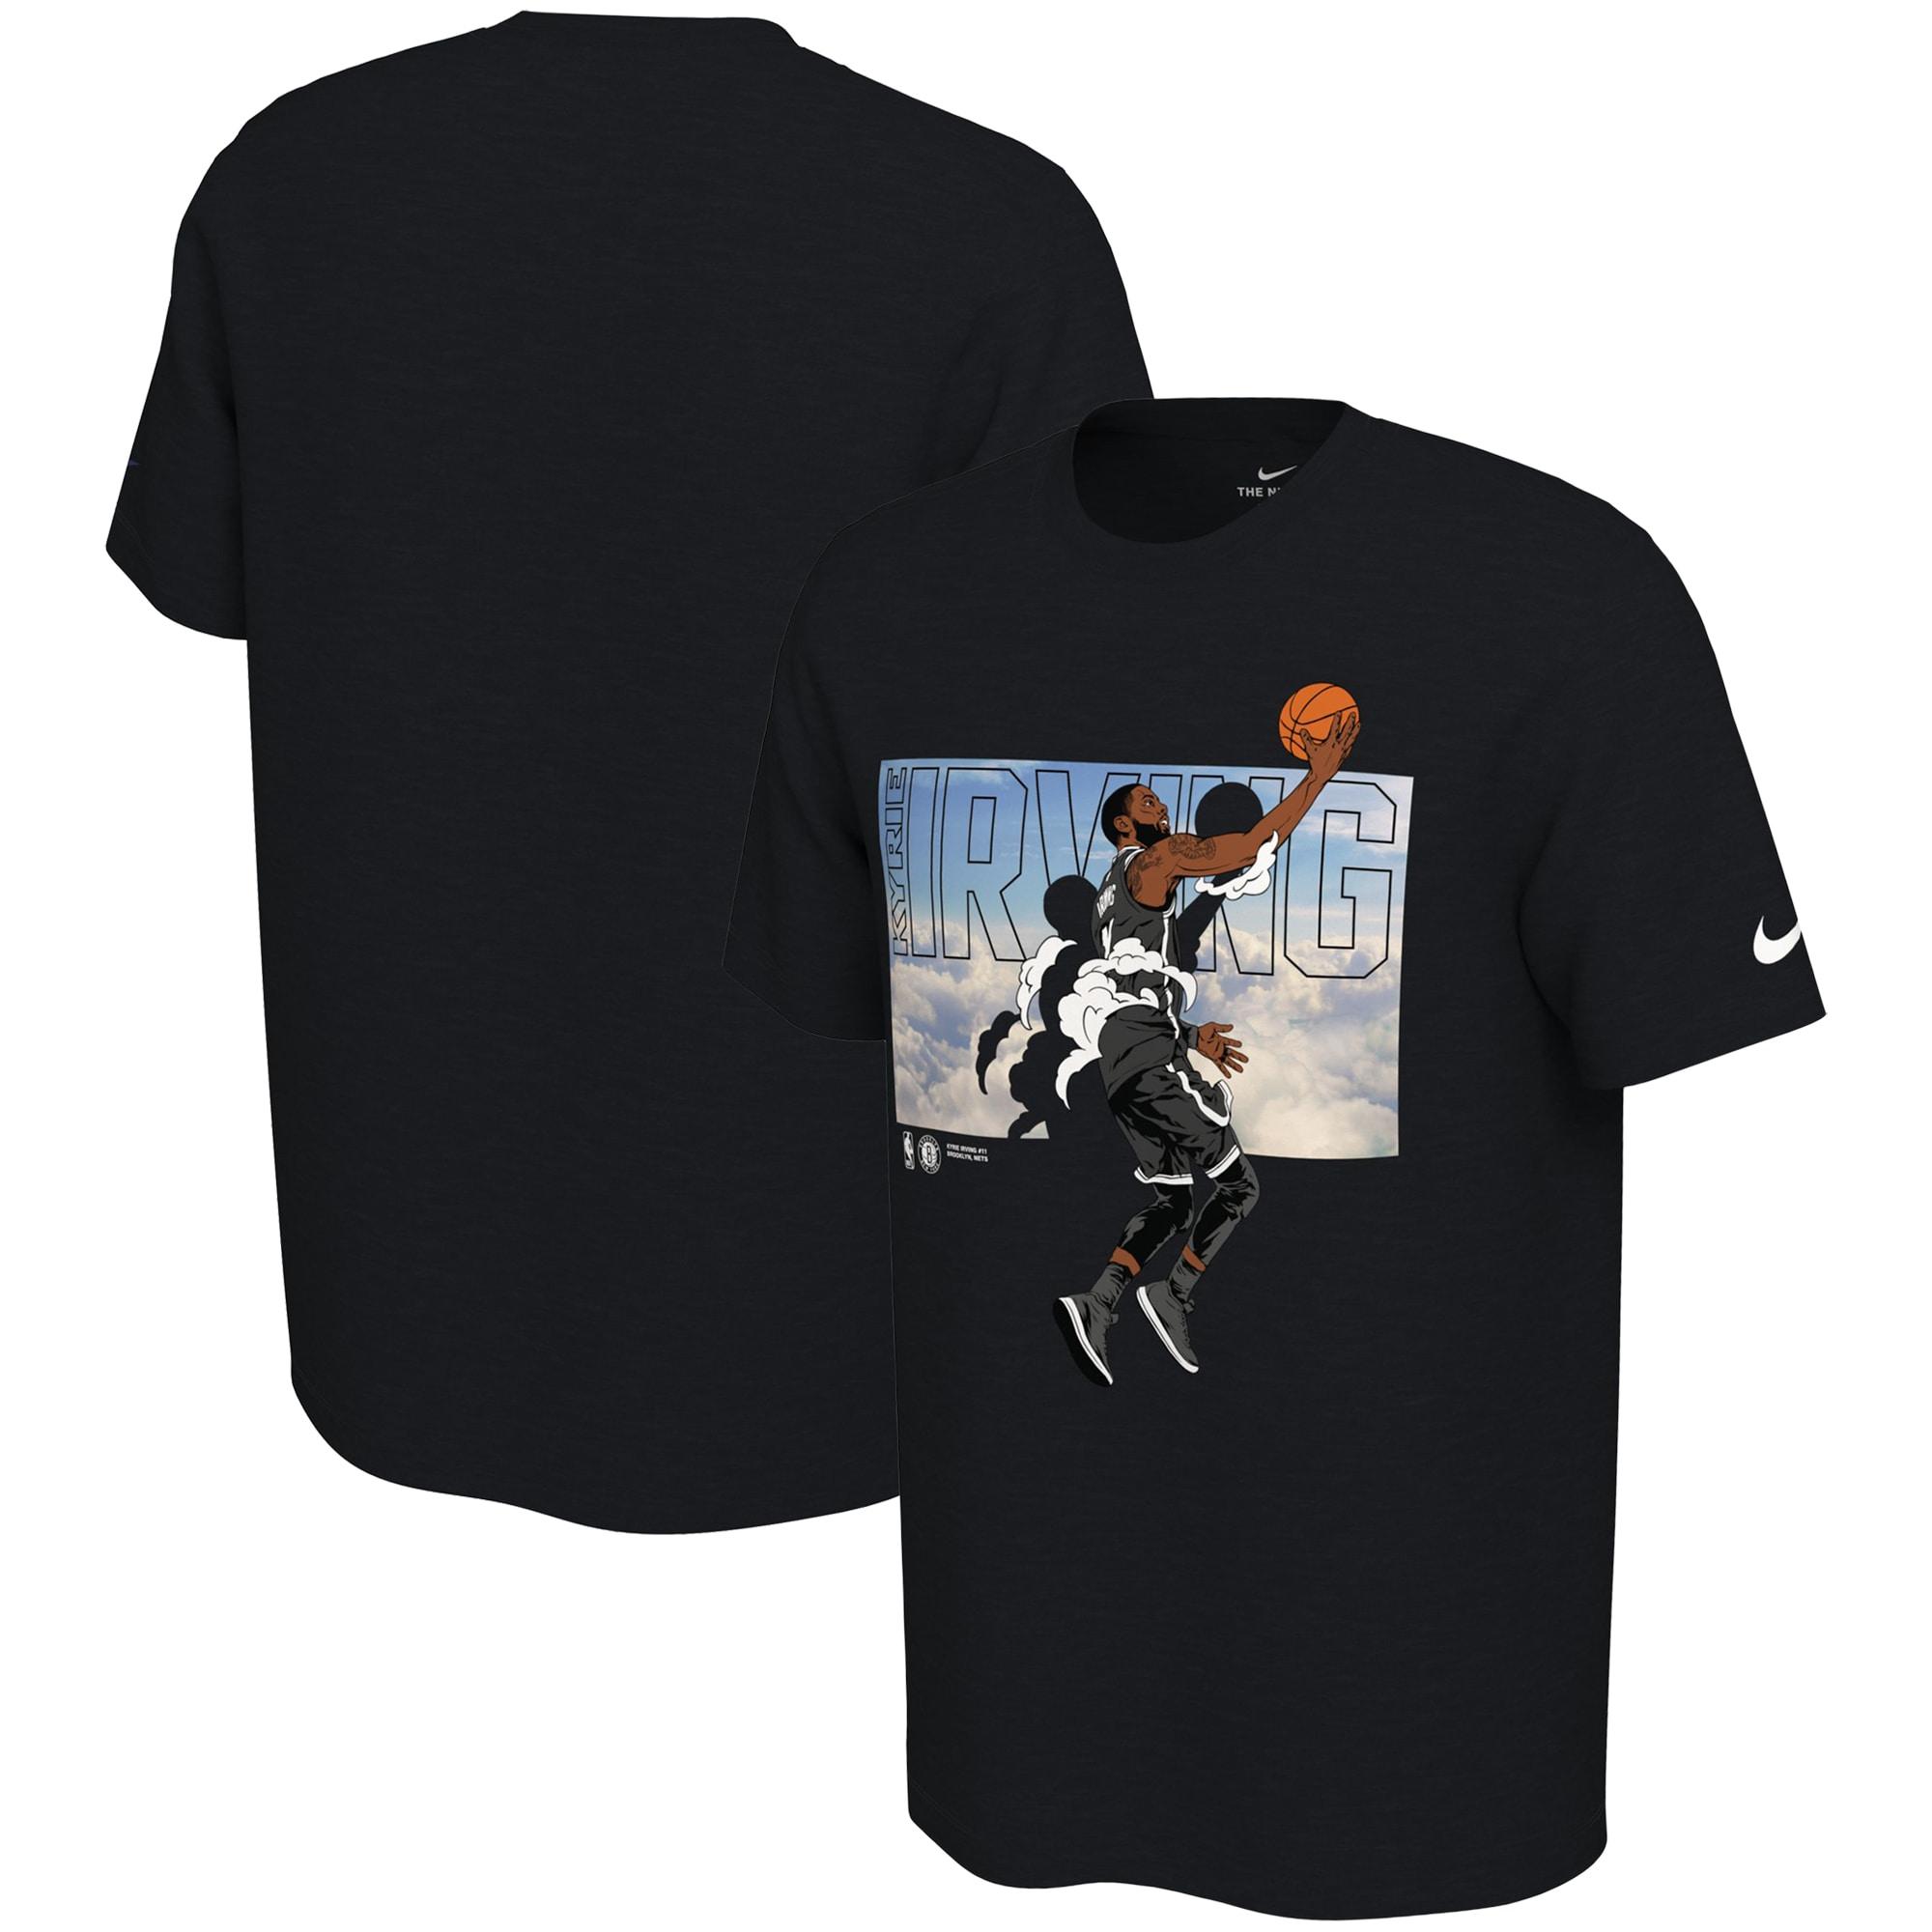 Kyrie Irving Brooklyn Nets Nike Elevation T-Shirt - Black